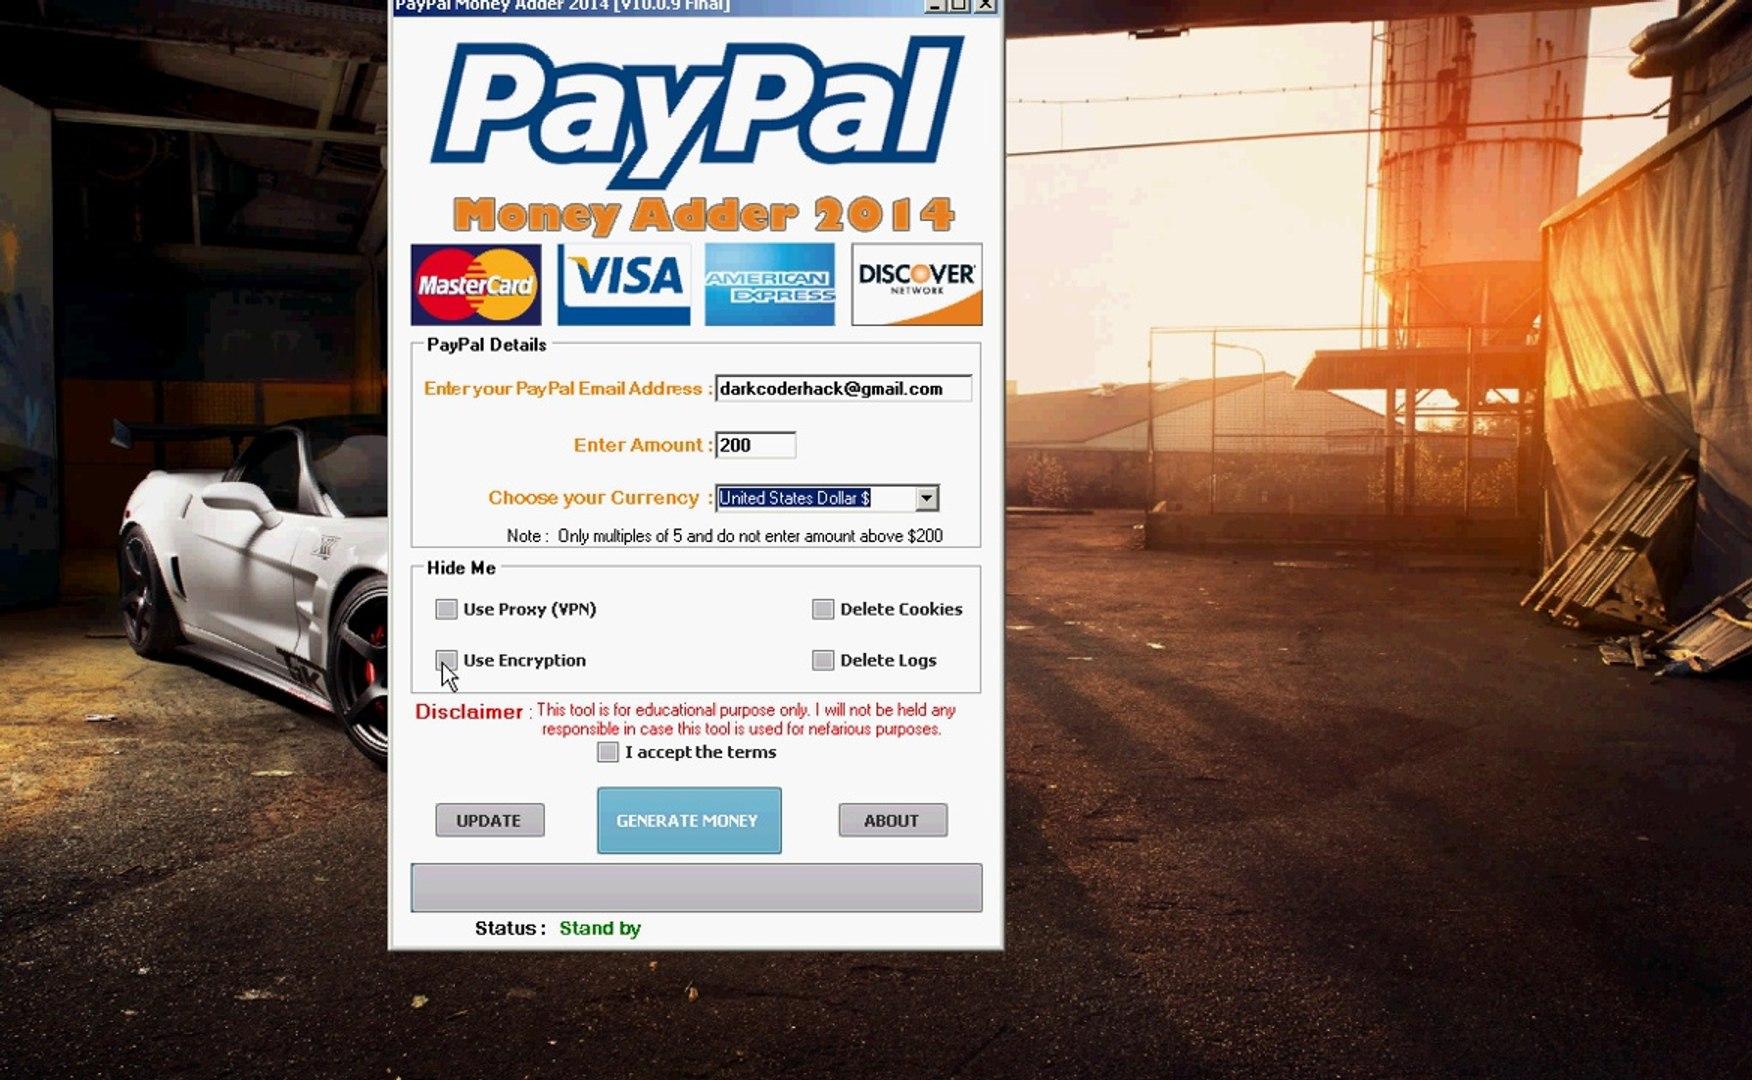 Paypal Money Adder [V10 0 9 Final] exe [No Survey Password][Free]